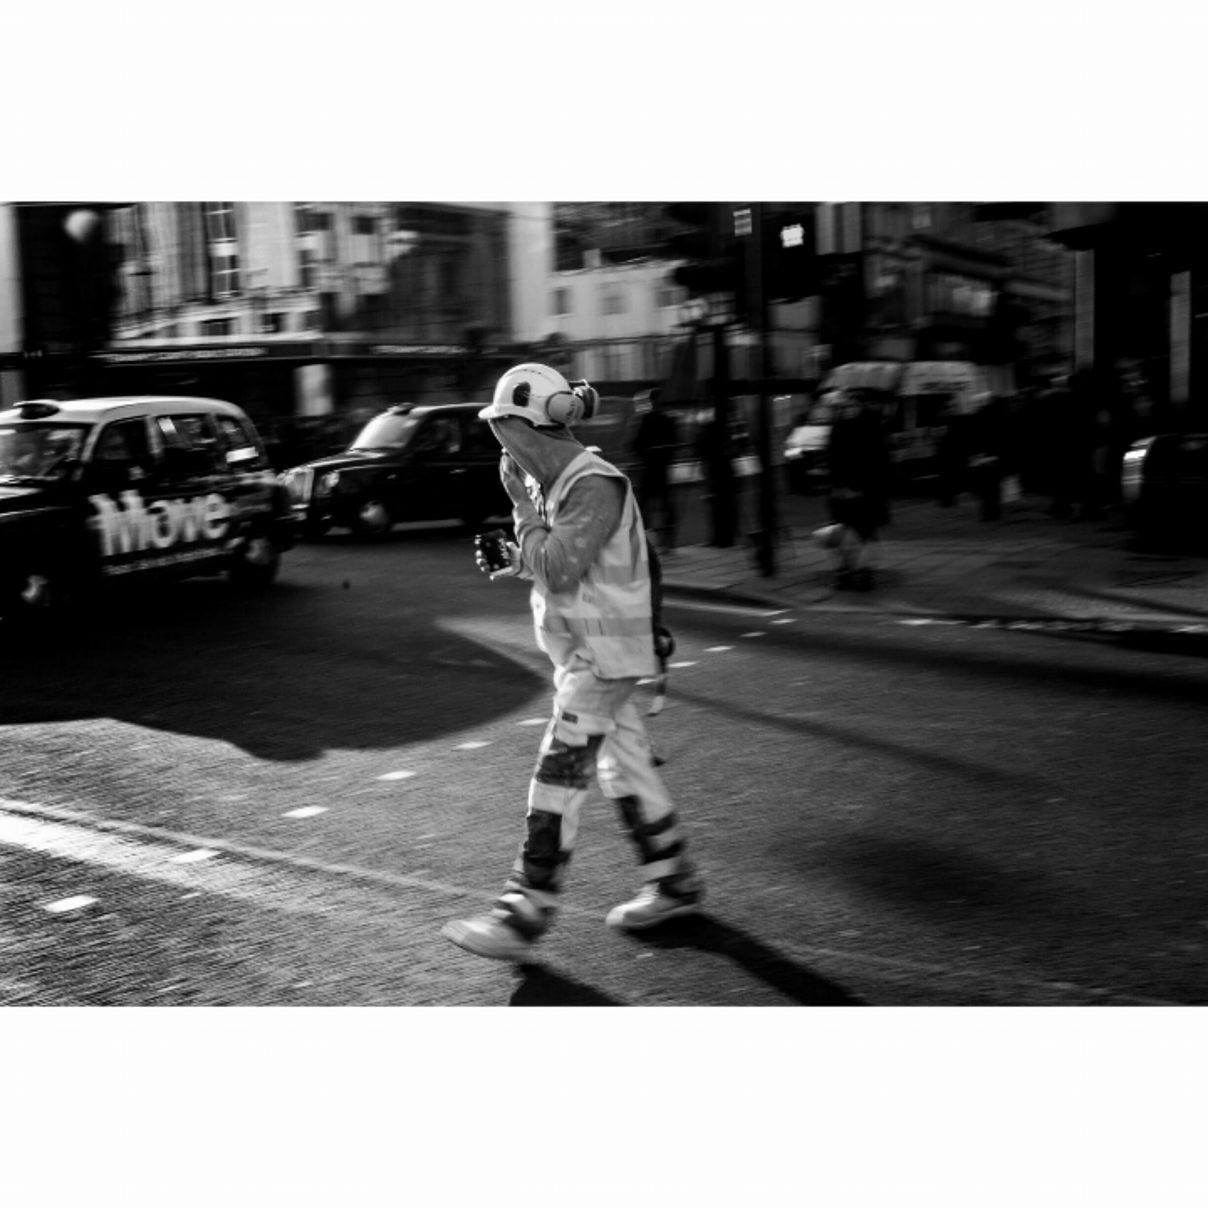 Construction Worker, London - January 2017